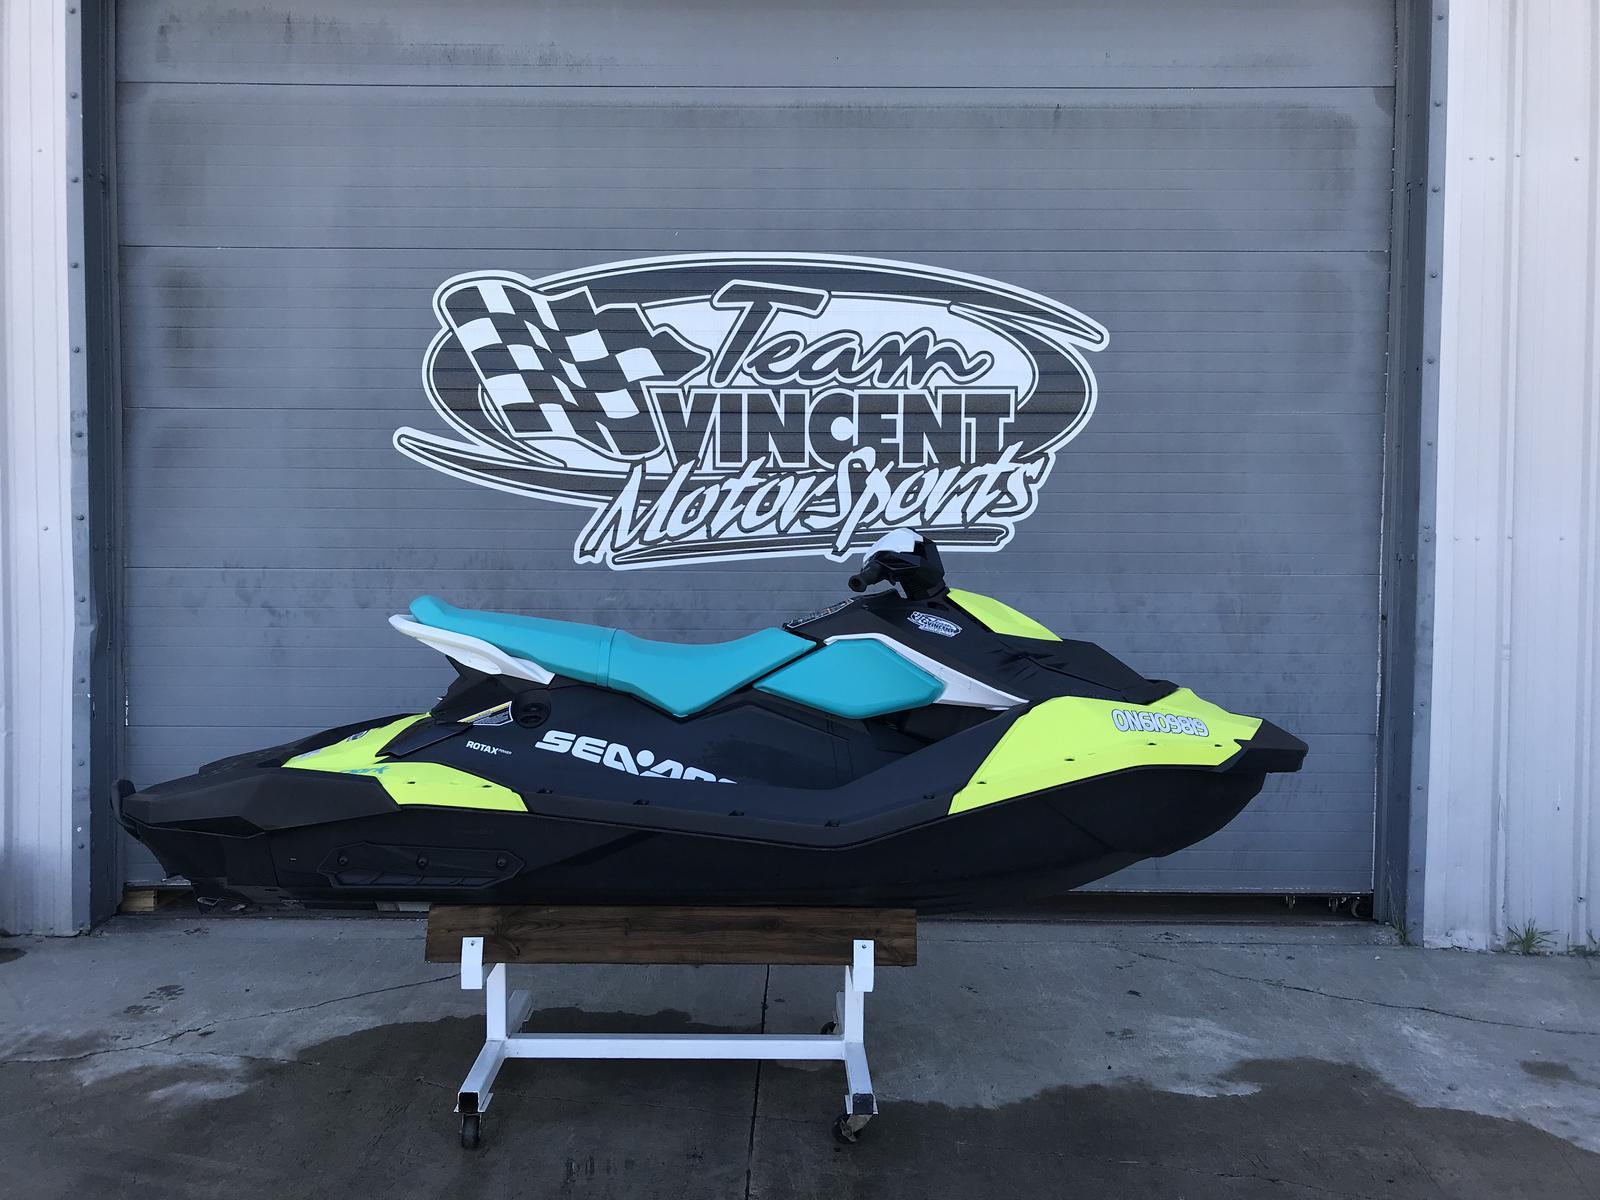 For Sale: 2018 Sea Doo Pwc Spark 3-up /90 Hp/ Loaded ft<br/>Team Vincent Motorsports Inc